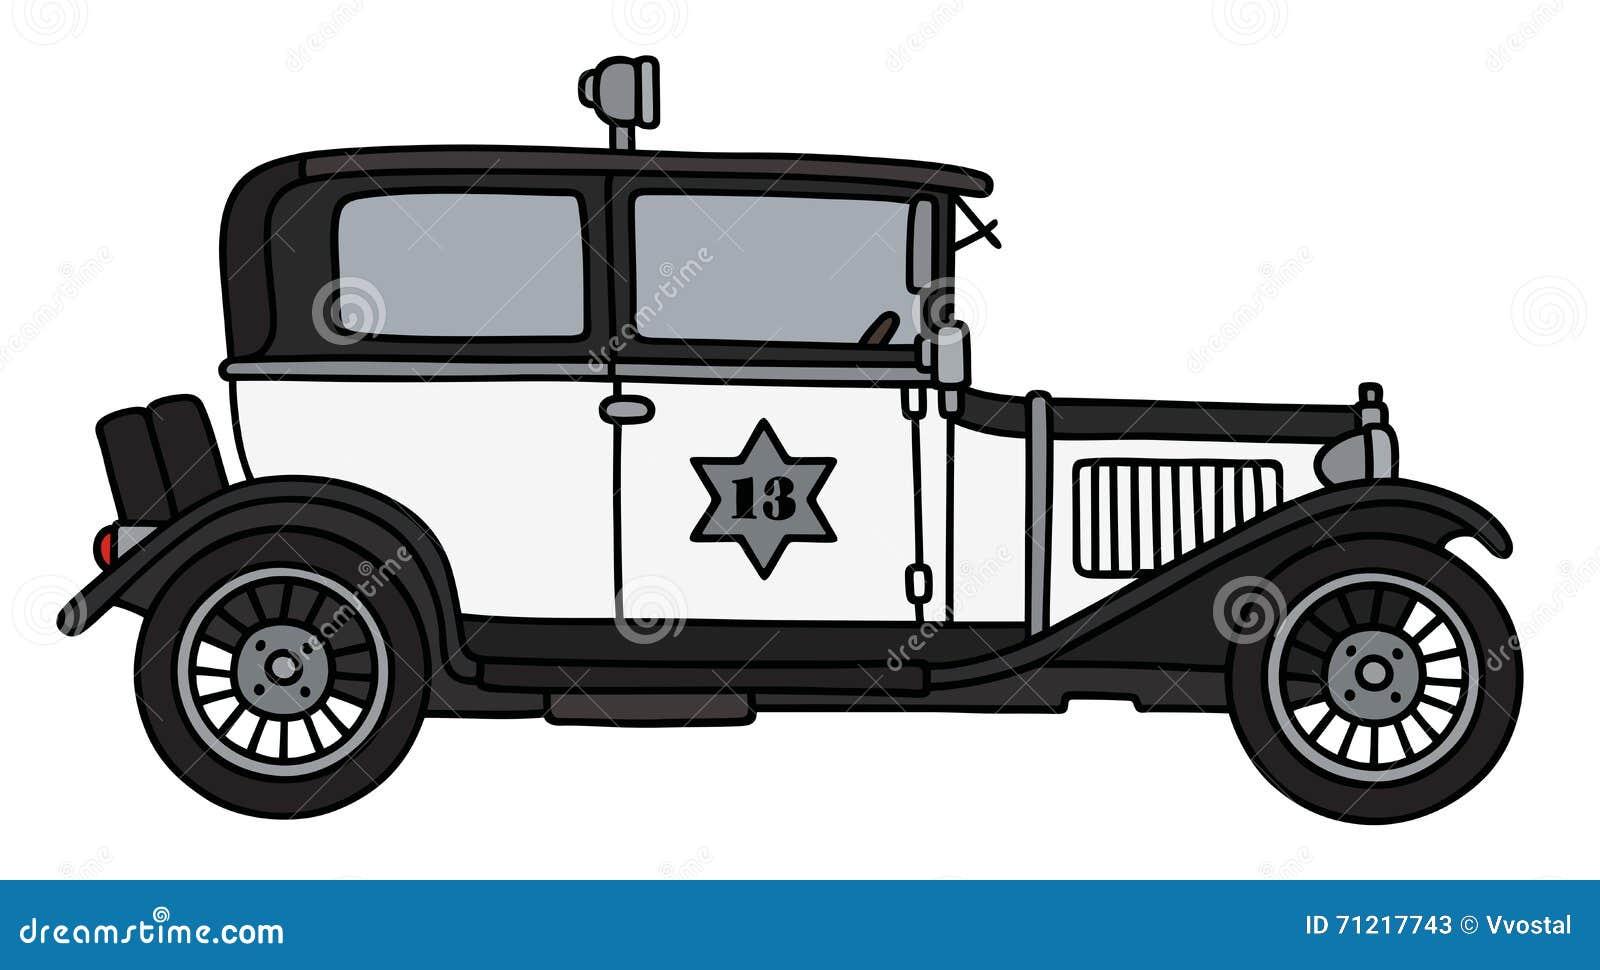 Vintage Police Car Stock Vector Illustration Of Star 71217743